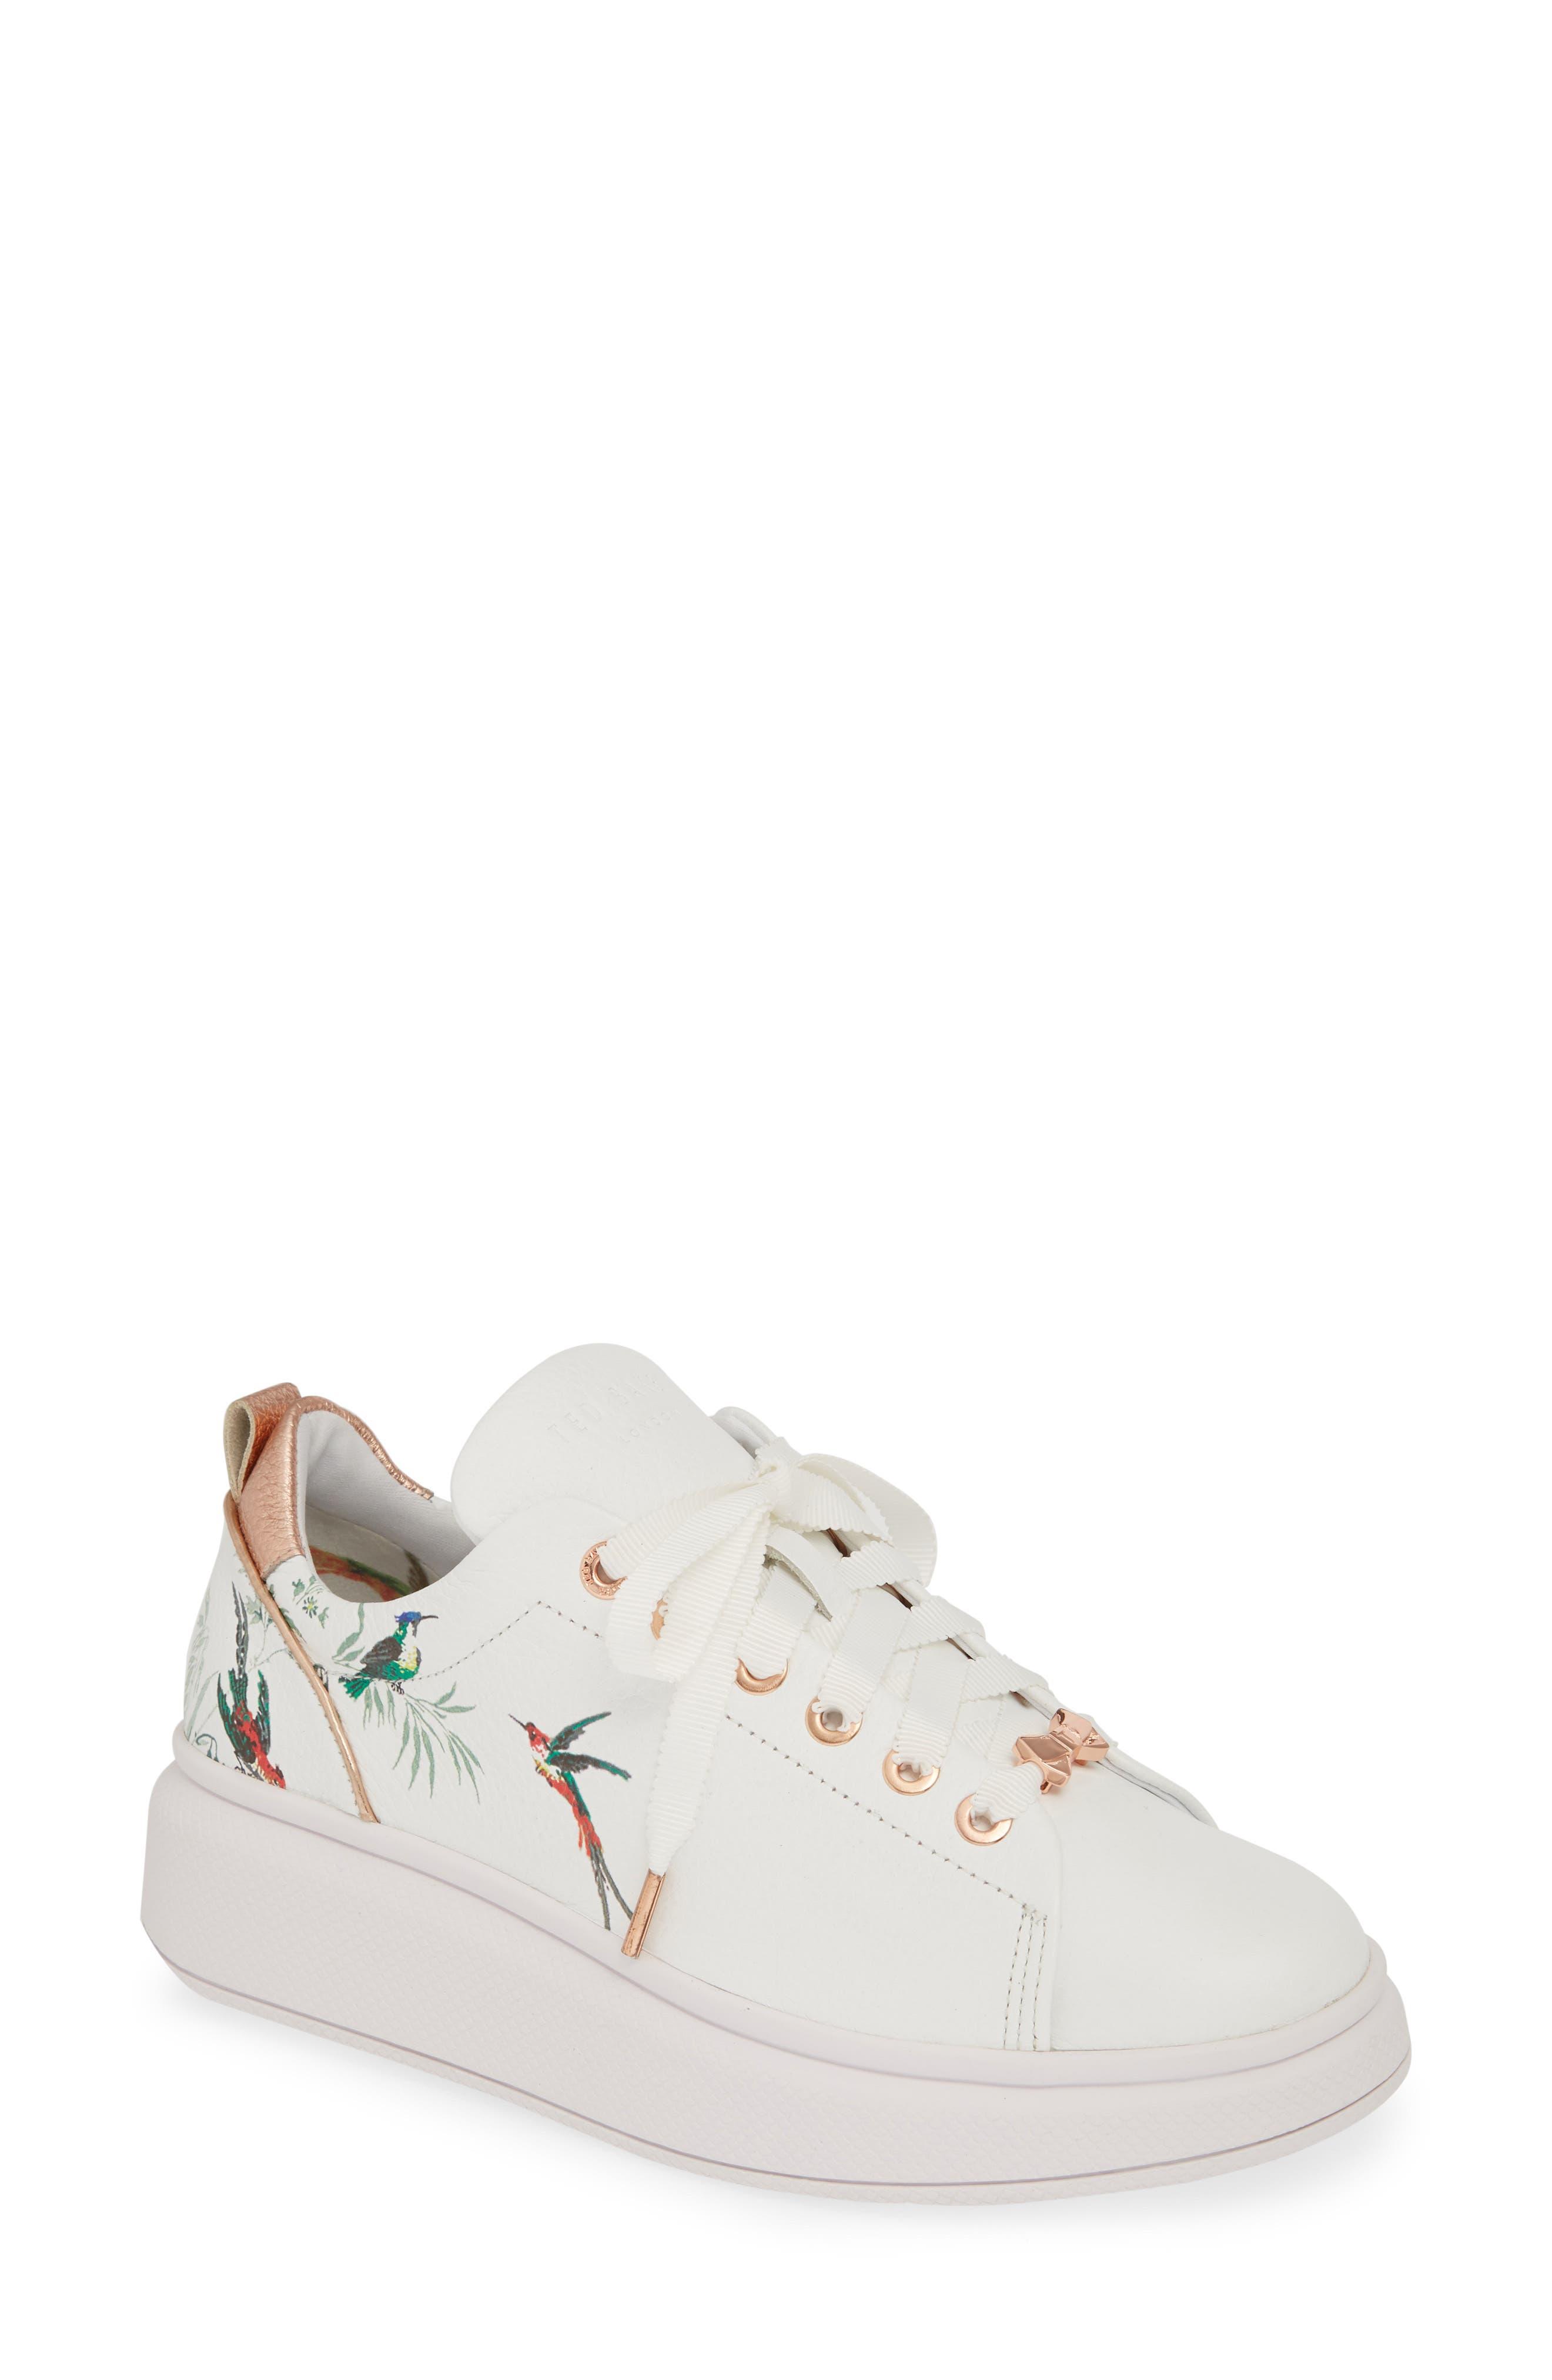 Ted Baker London Ailbe 4 Printed Sneaker, White